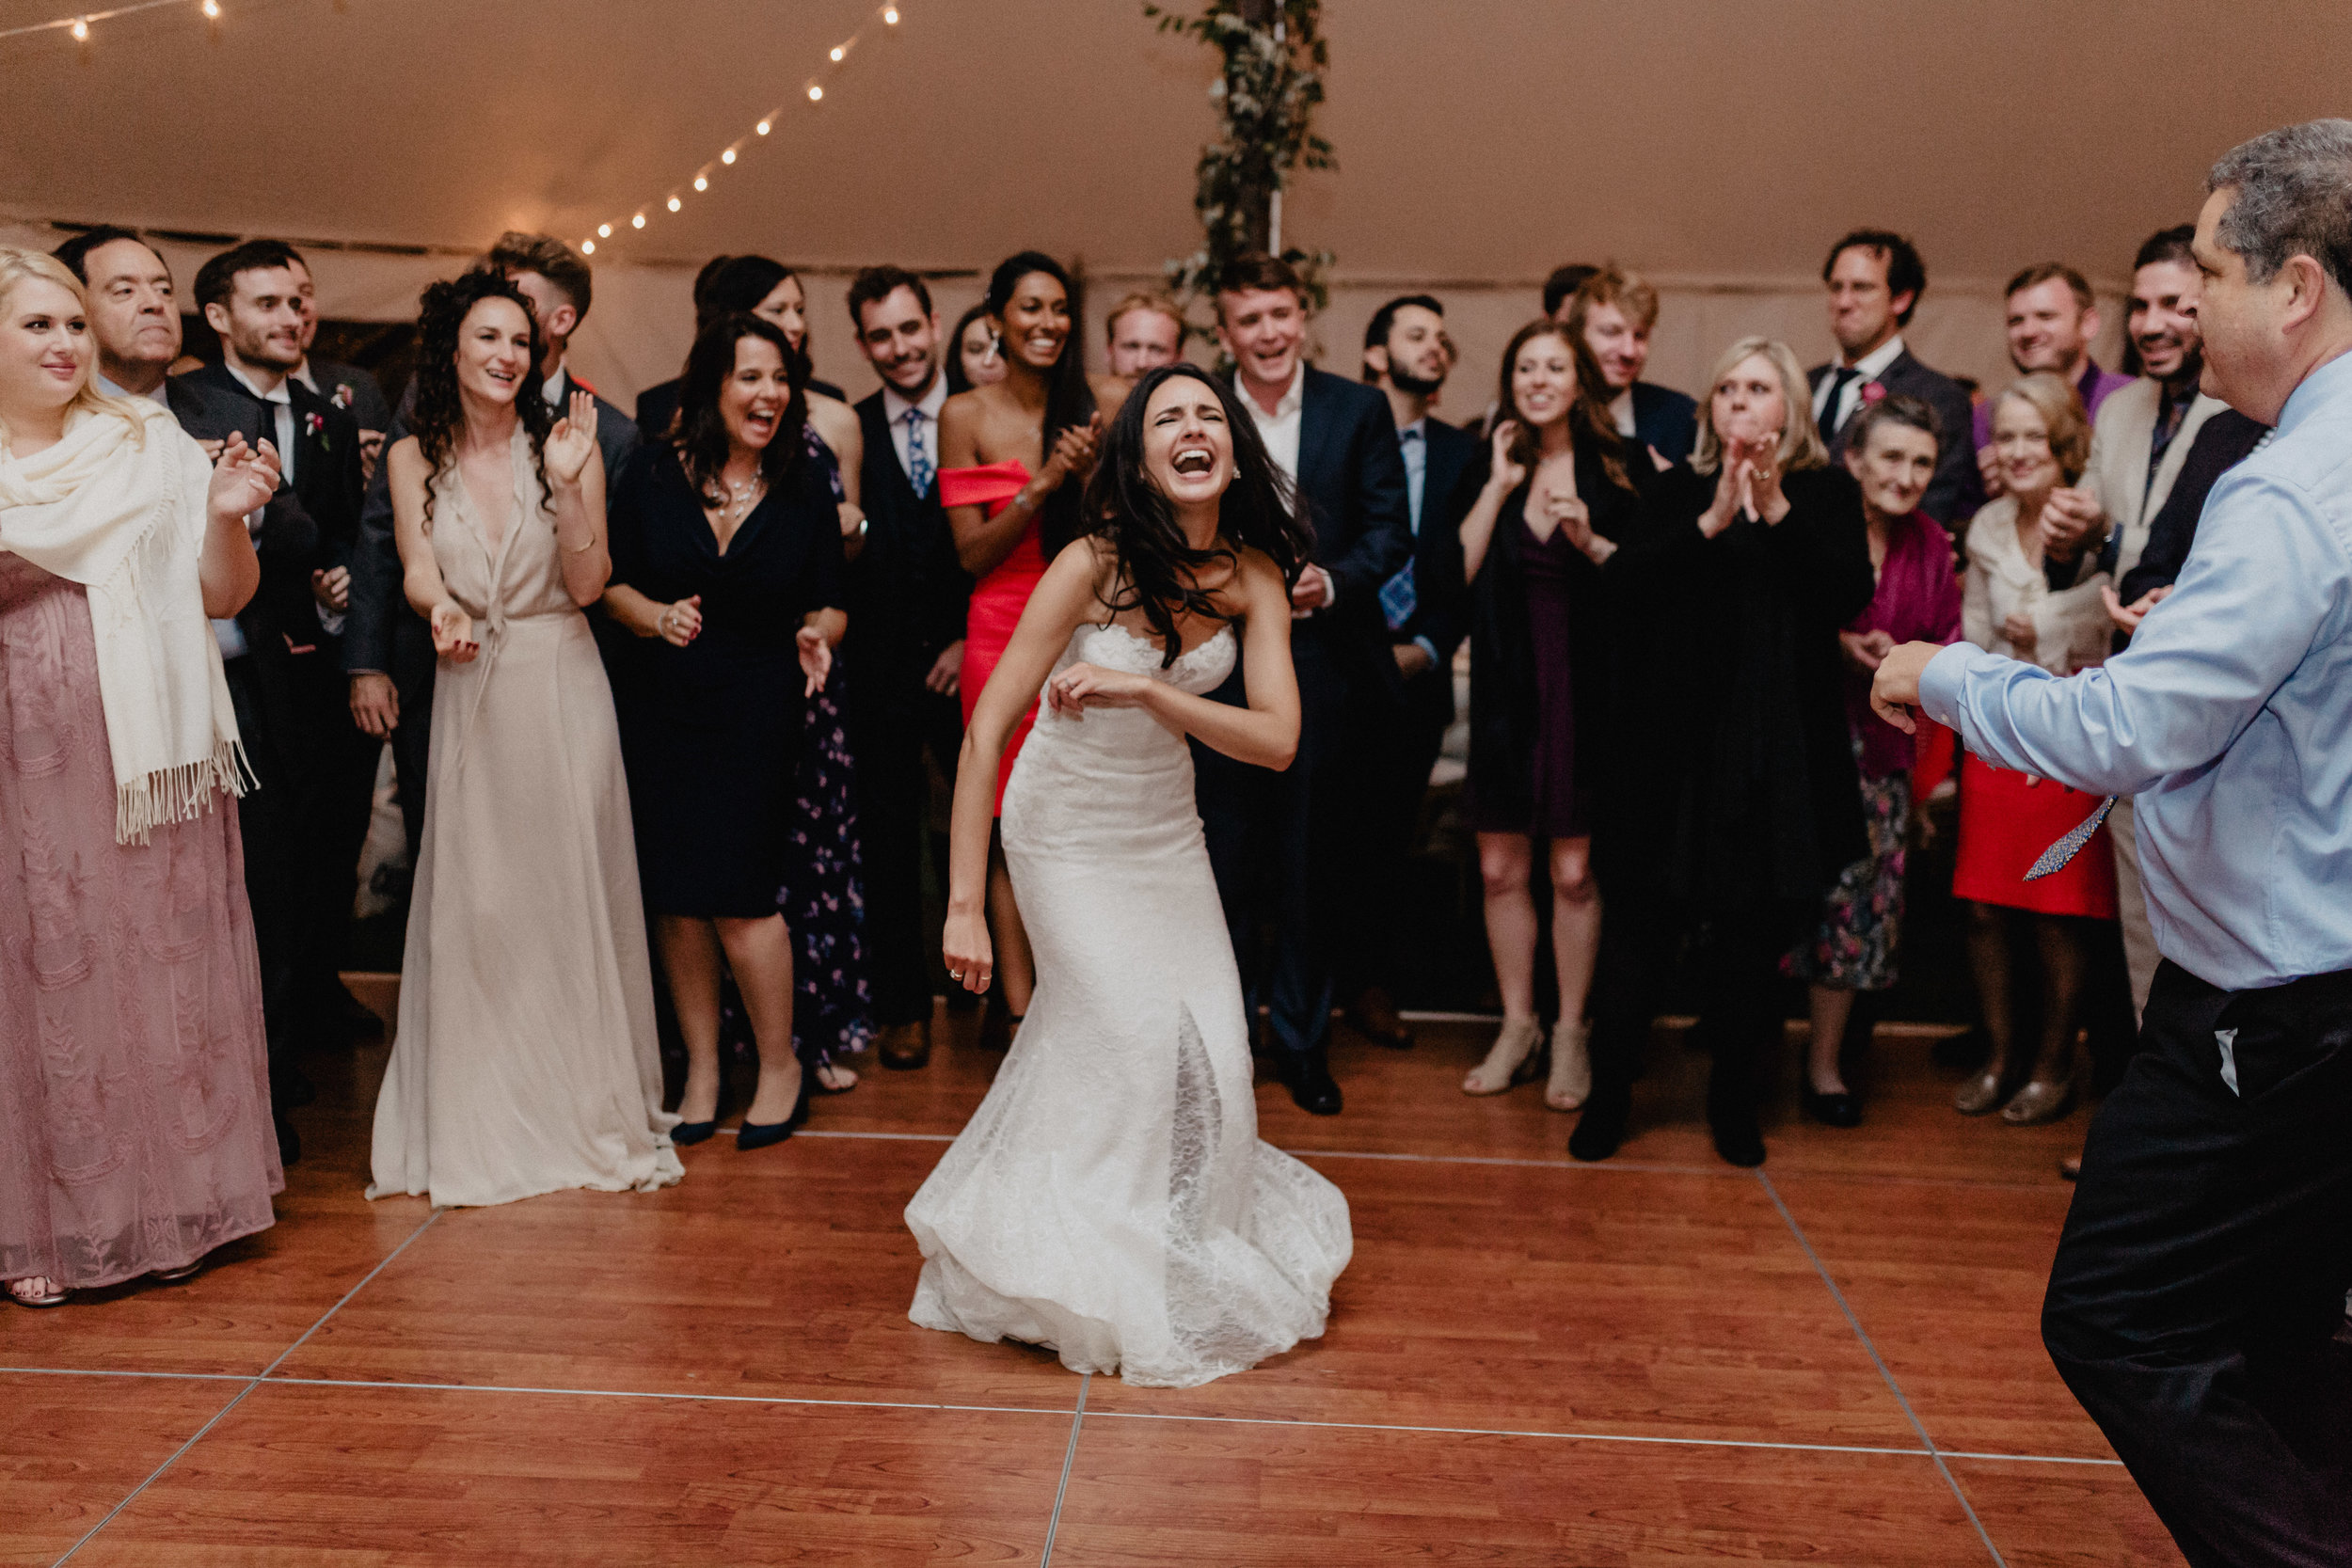 deer_mountain_inn_wedding_124.jpg